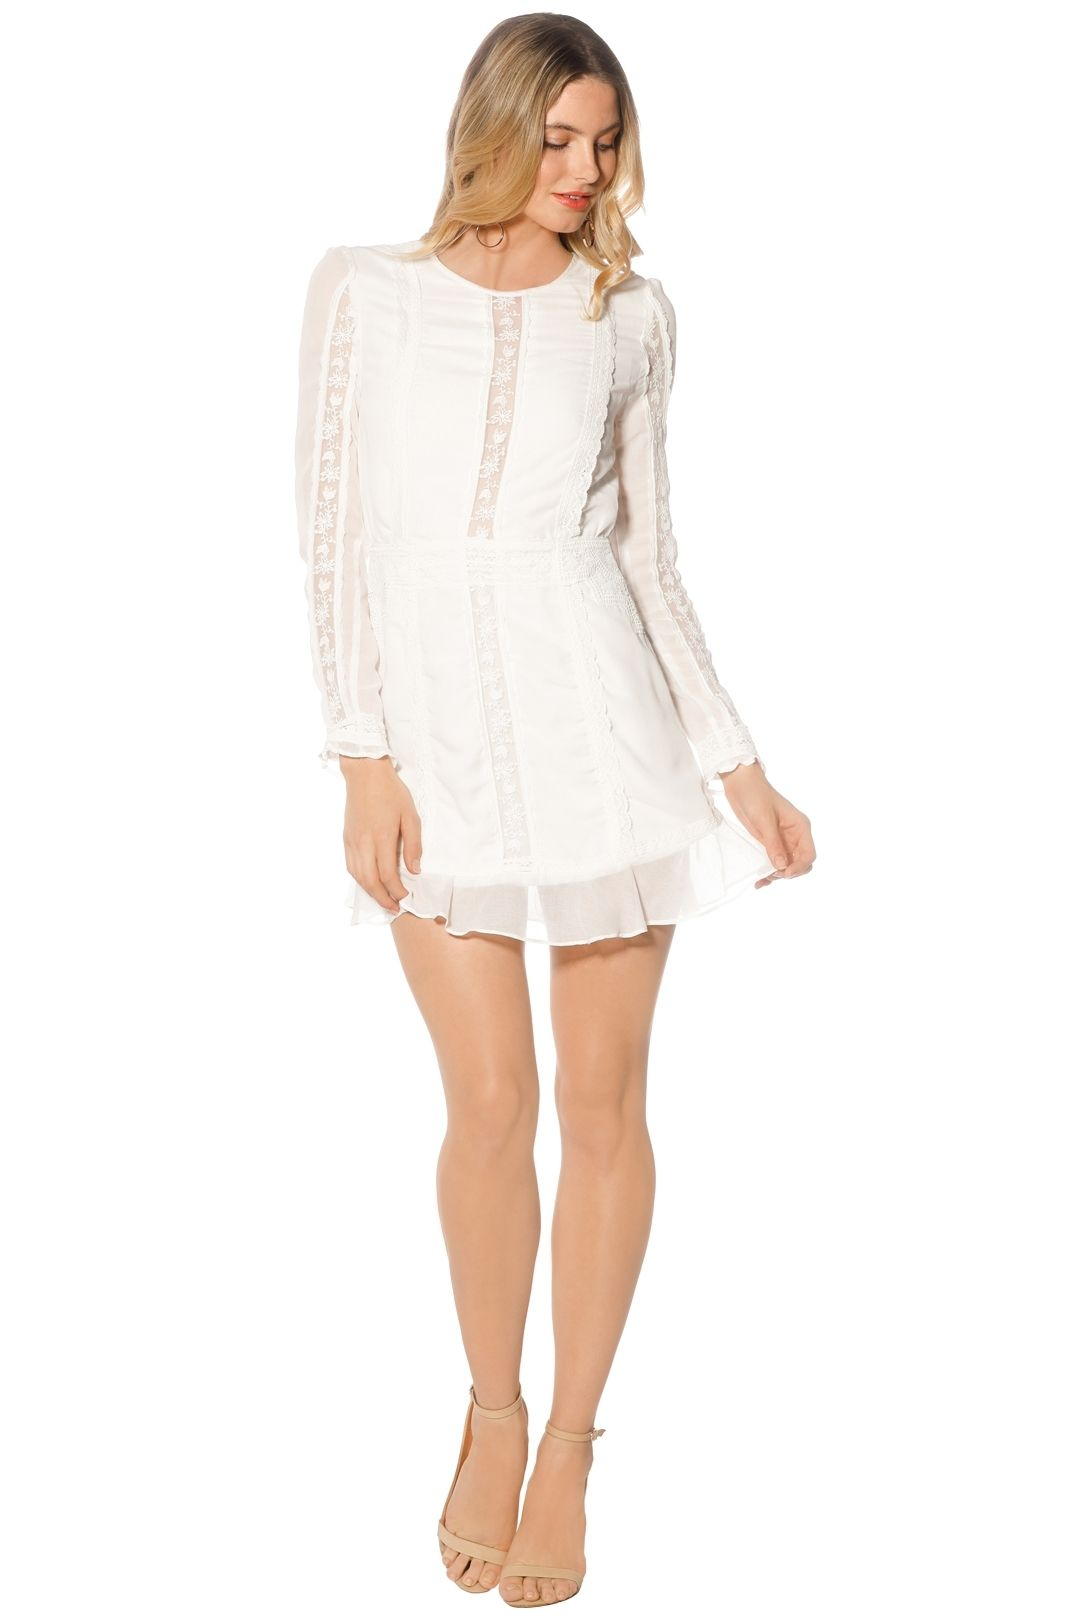 The Jetset Diaries - Amorie Mini Dress - White - Front